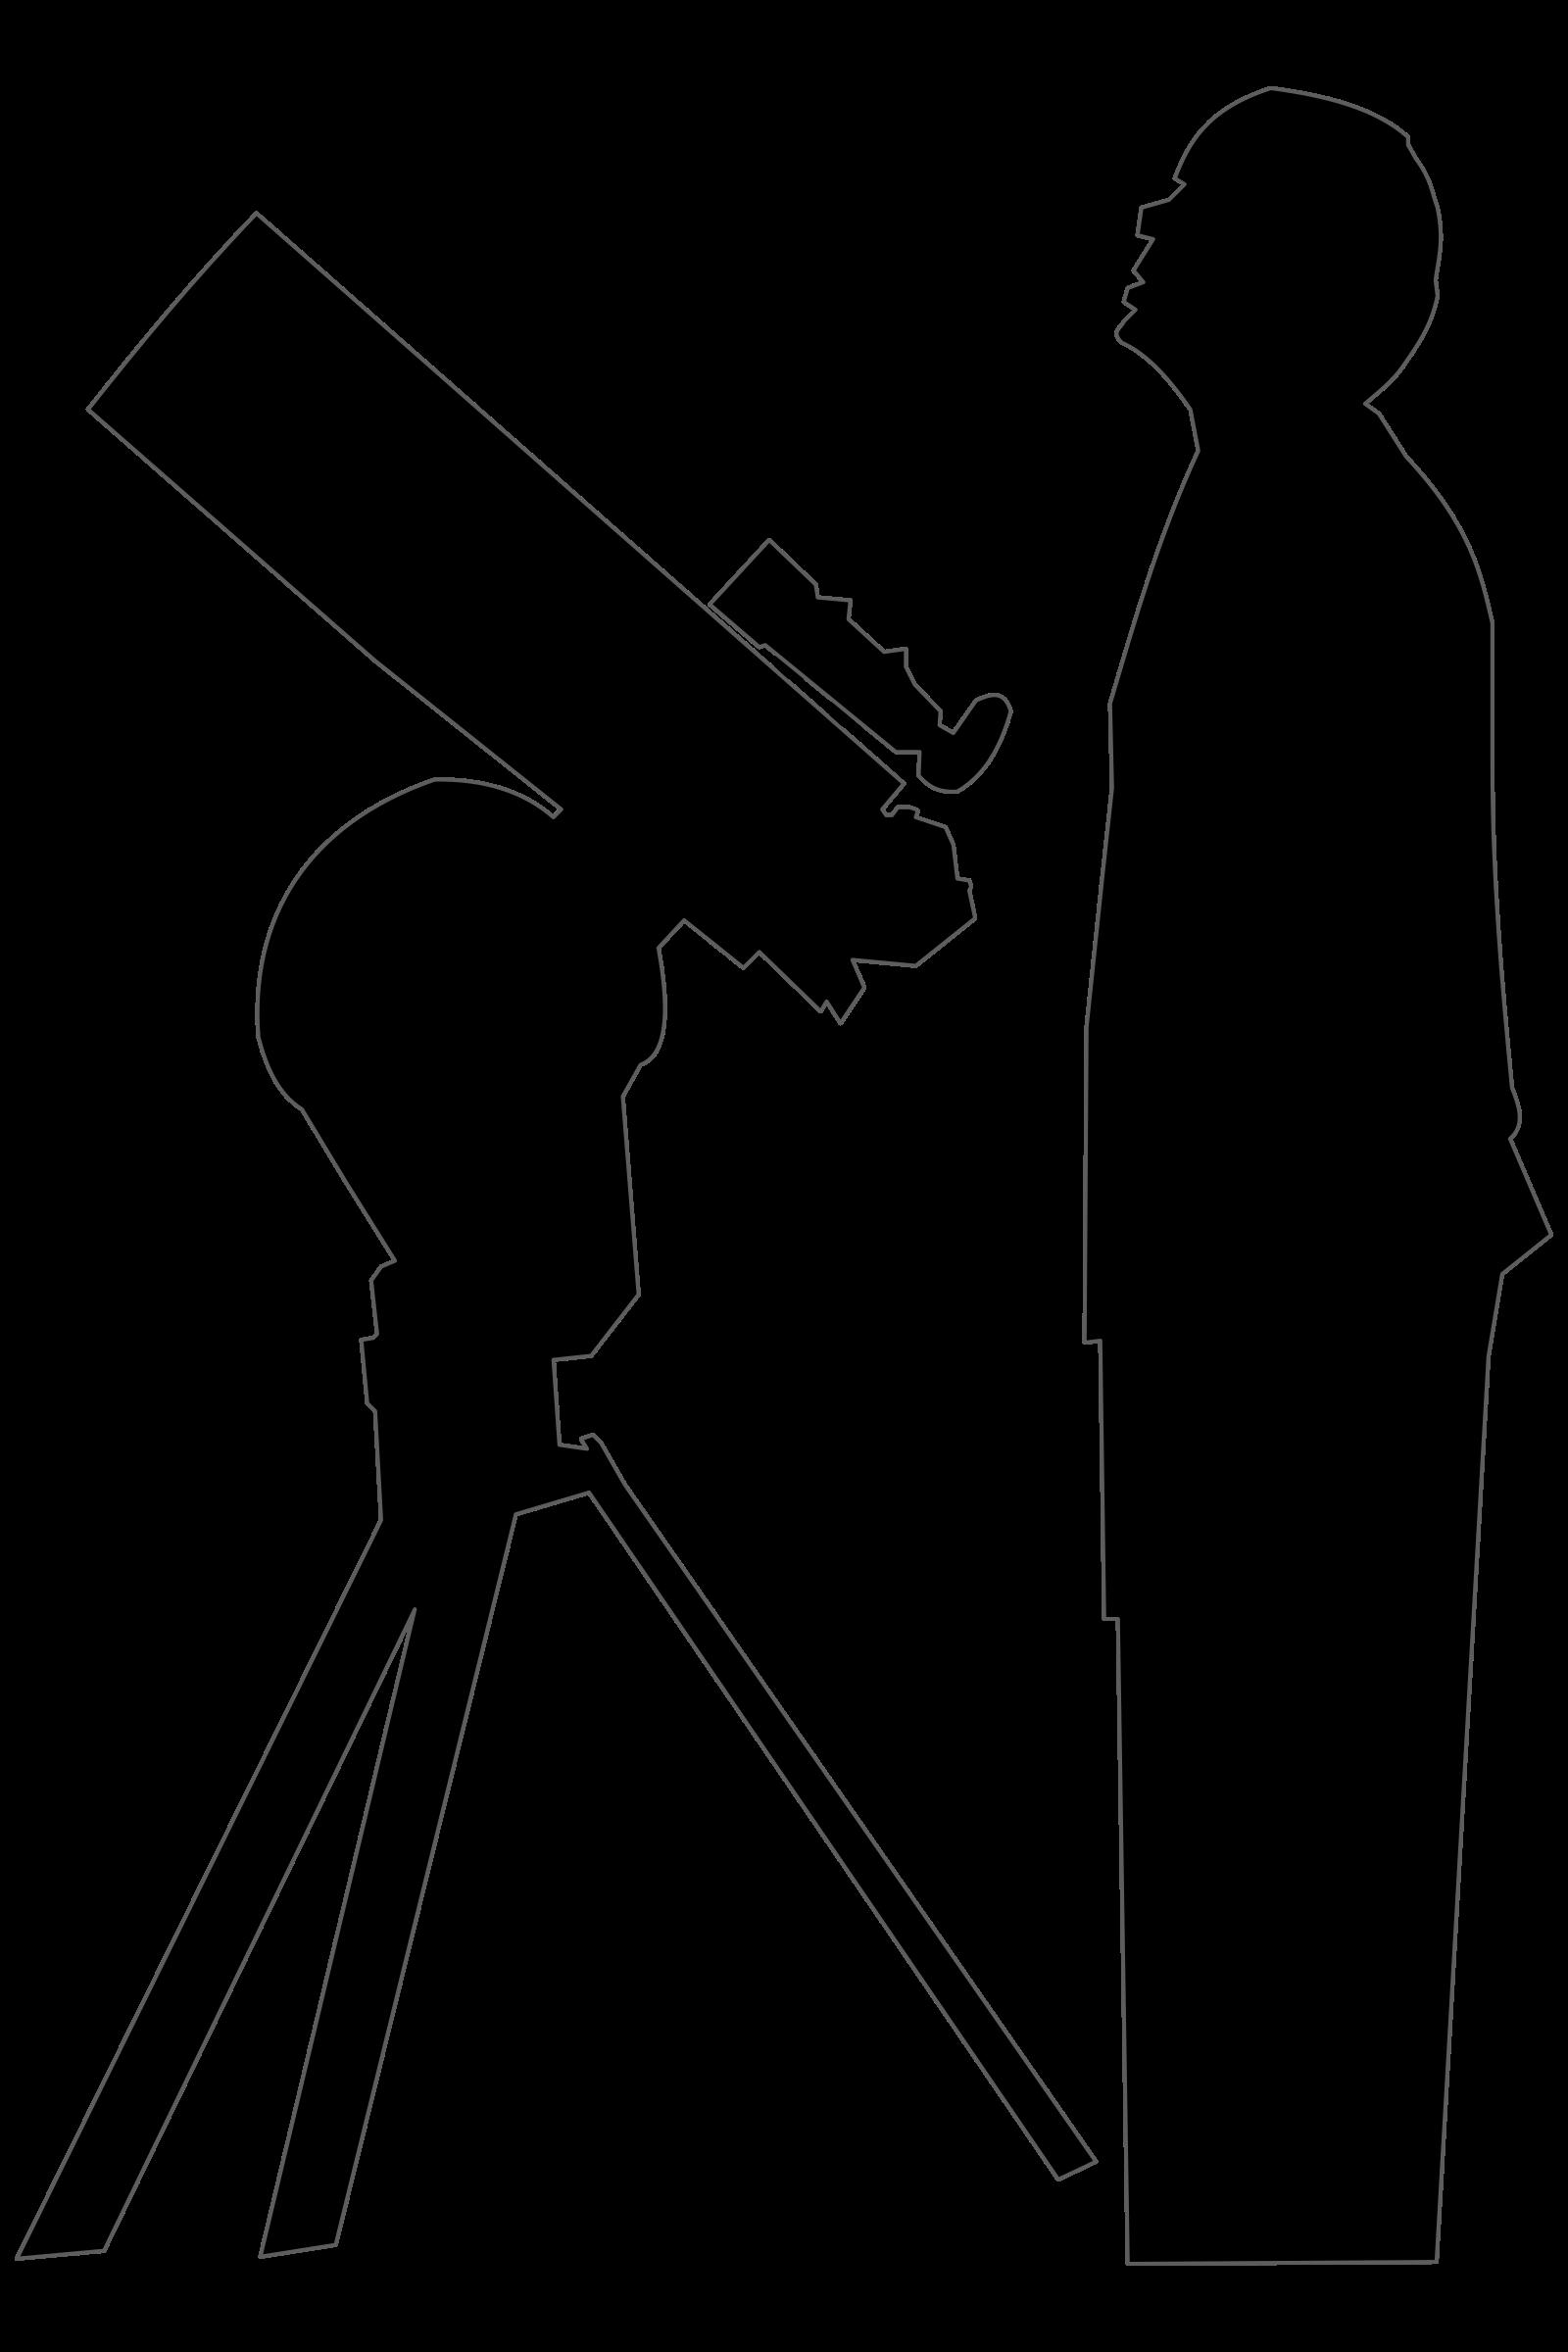 Astronomy clipart clip art. Amateur astronomer big image